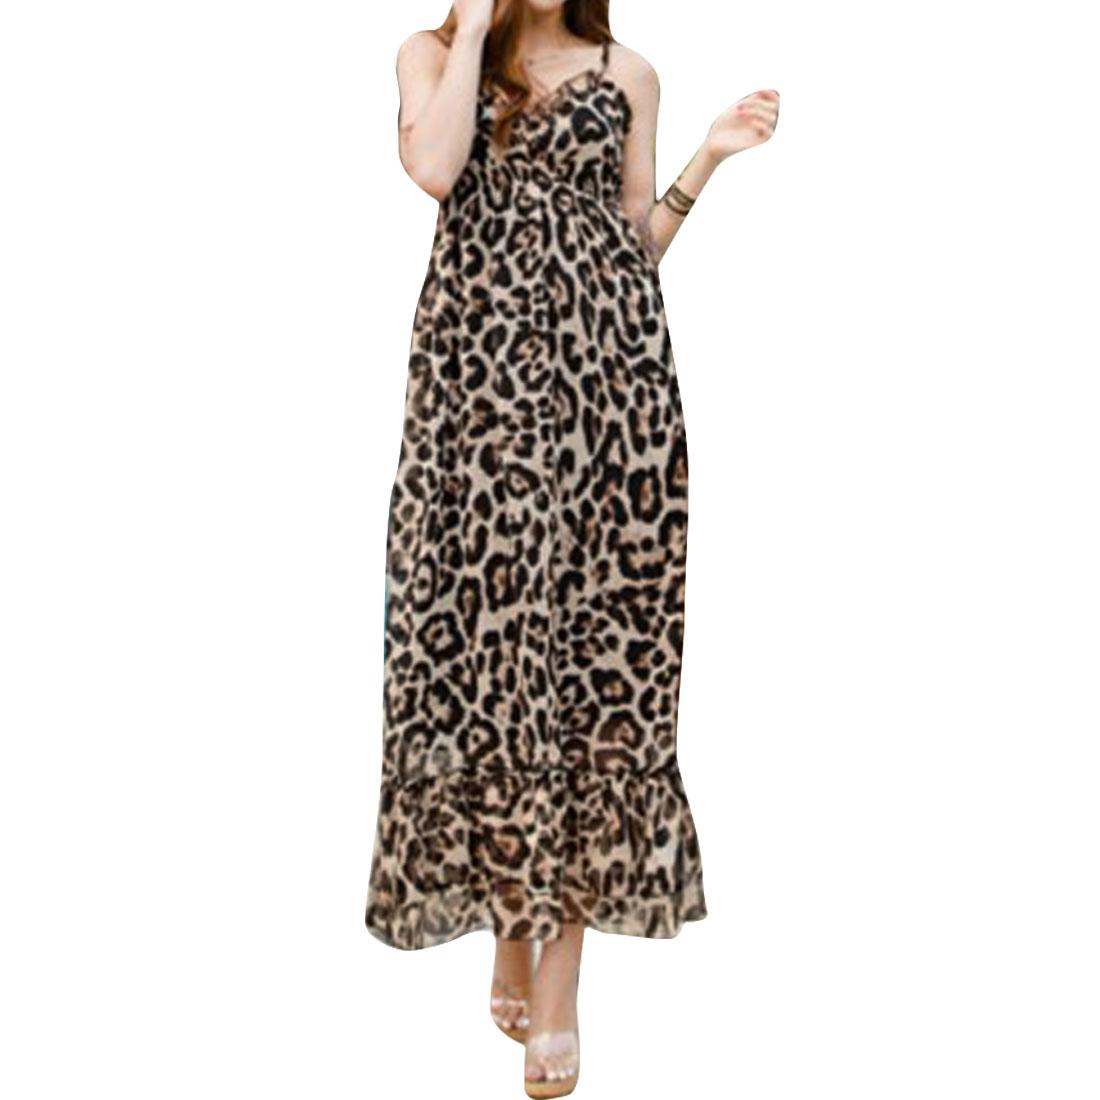 Women Leopard Pattern Deep V Neck Design Spaghetti Strap Dress XS Black